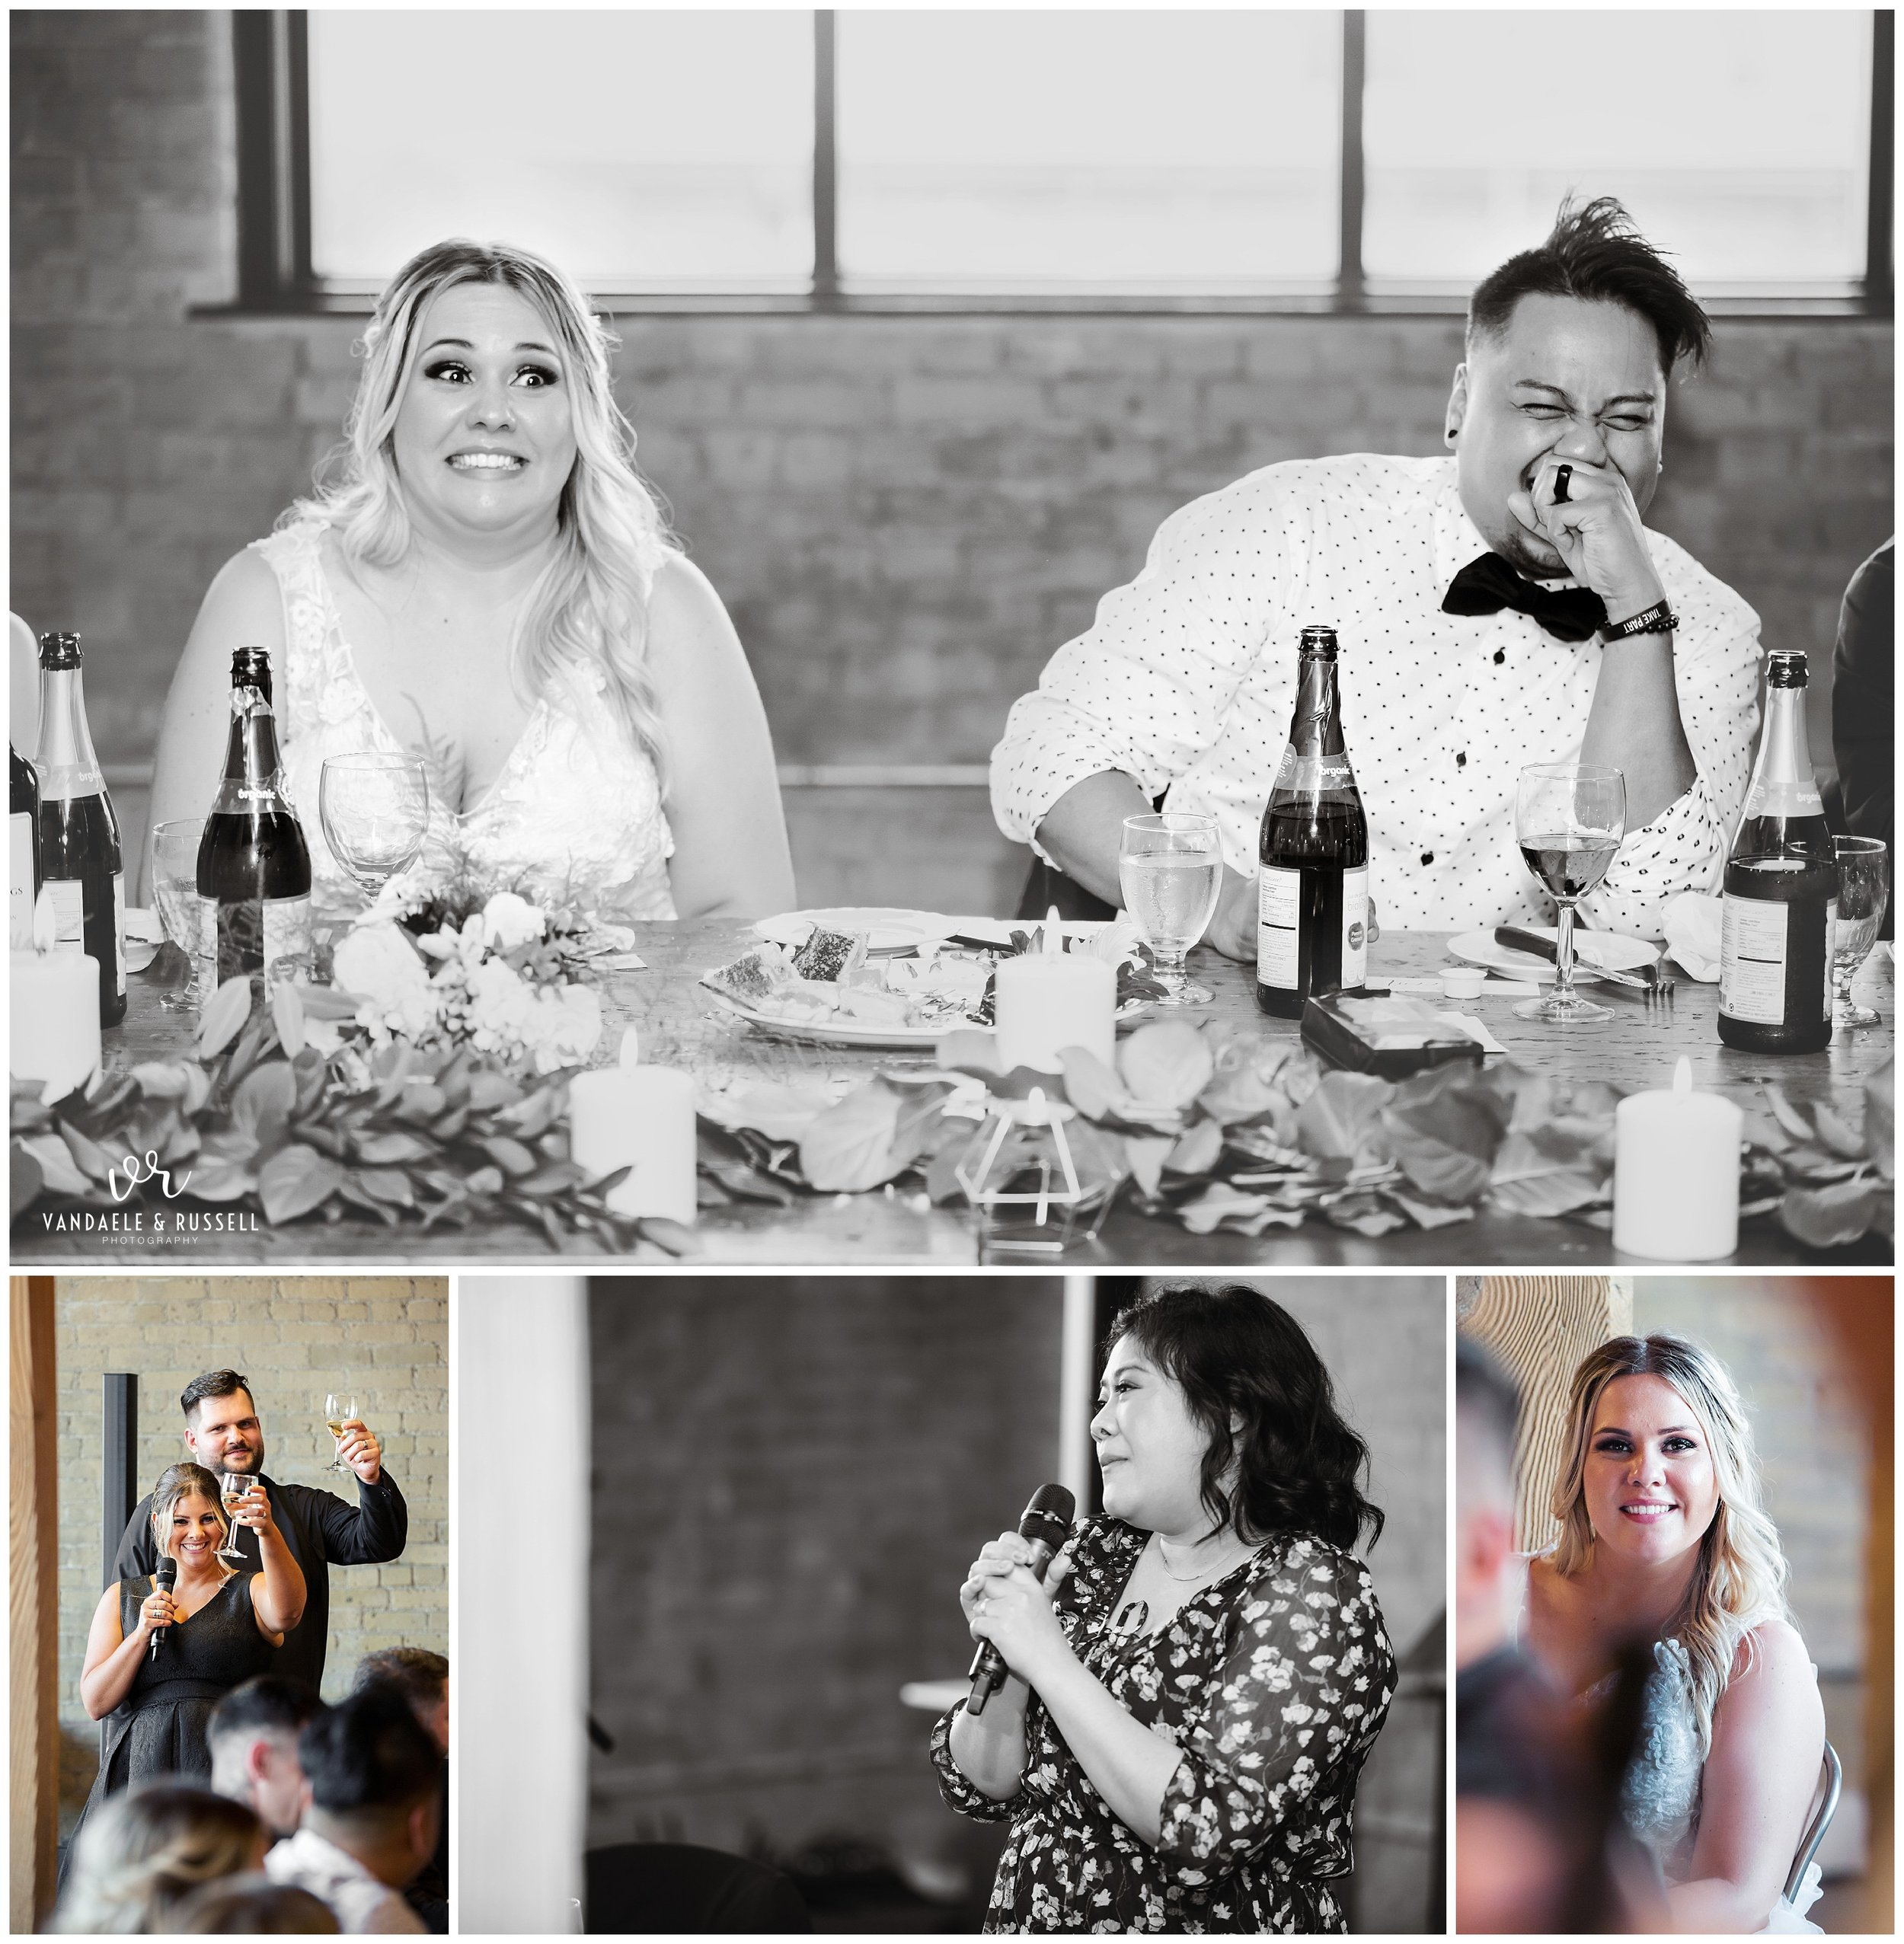 VanDaele-Russell-Wedding-Photography-London-Toronto-Ontario_0124.jpg